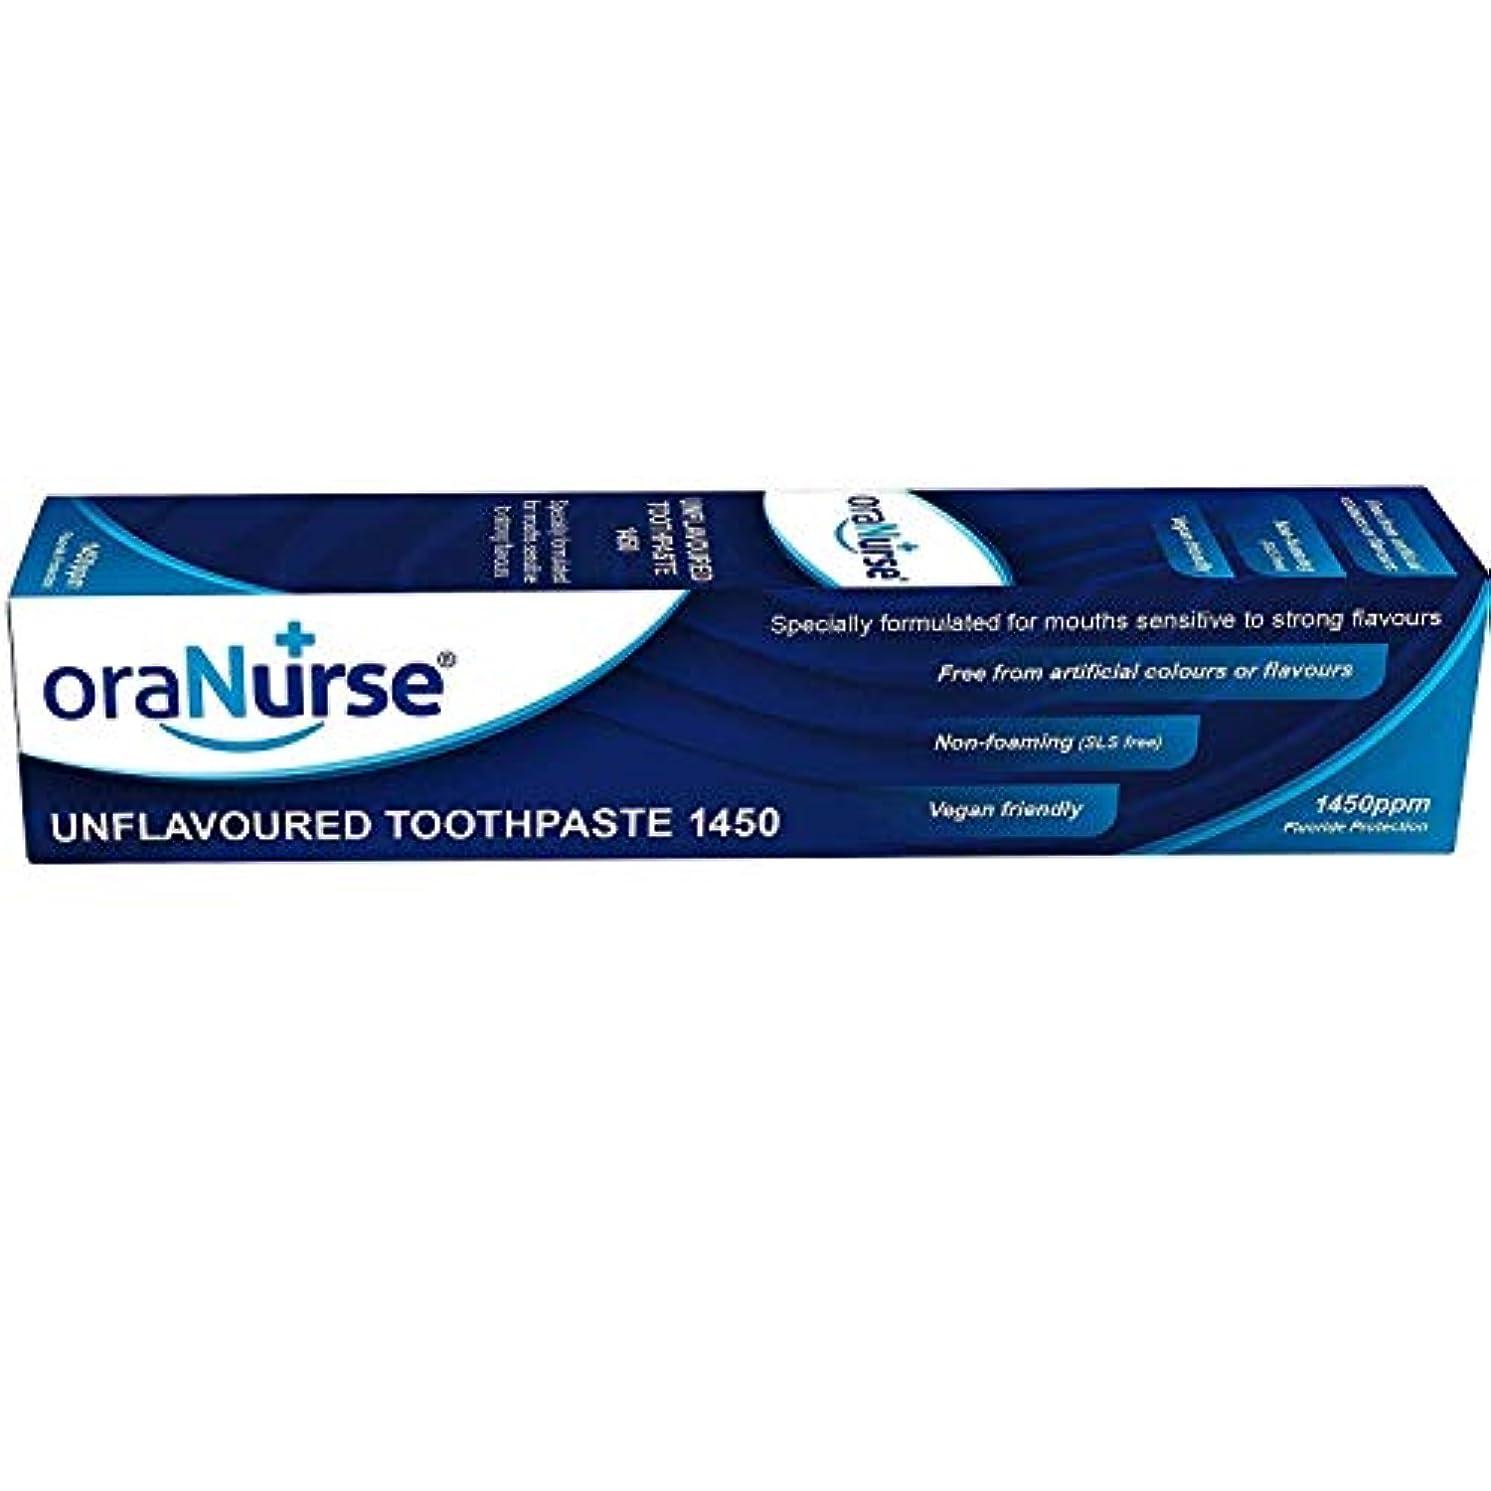 教える認証批判Oranurse Toothpaste 50Ml Unflavoured 1450Ppm Fluoride by Oranurse